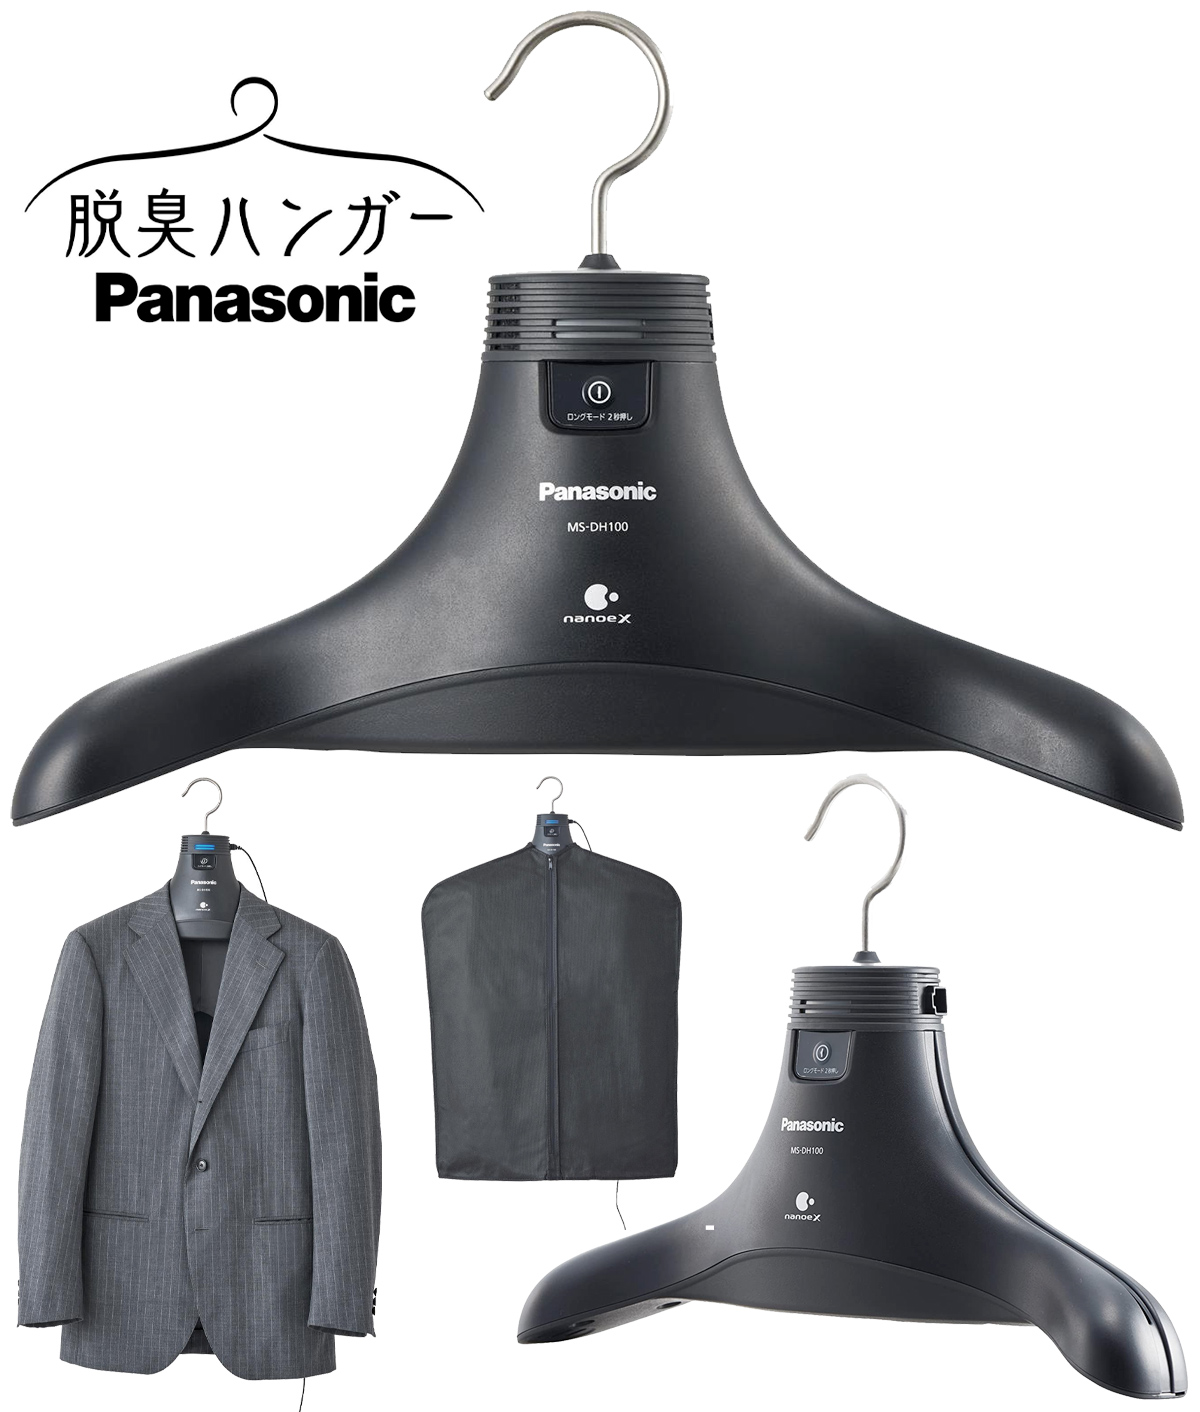 Cabide Eletrônico Panasonic MS-DH100